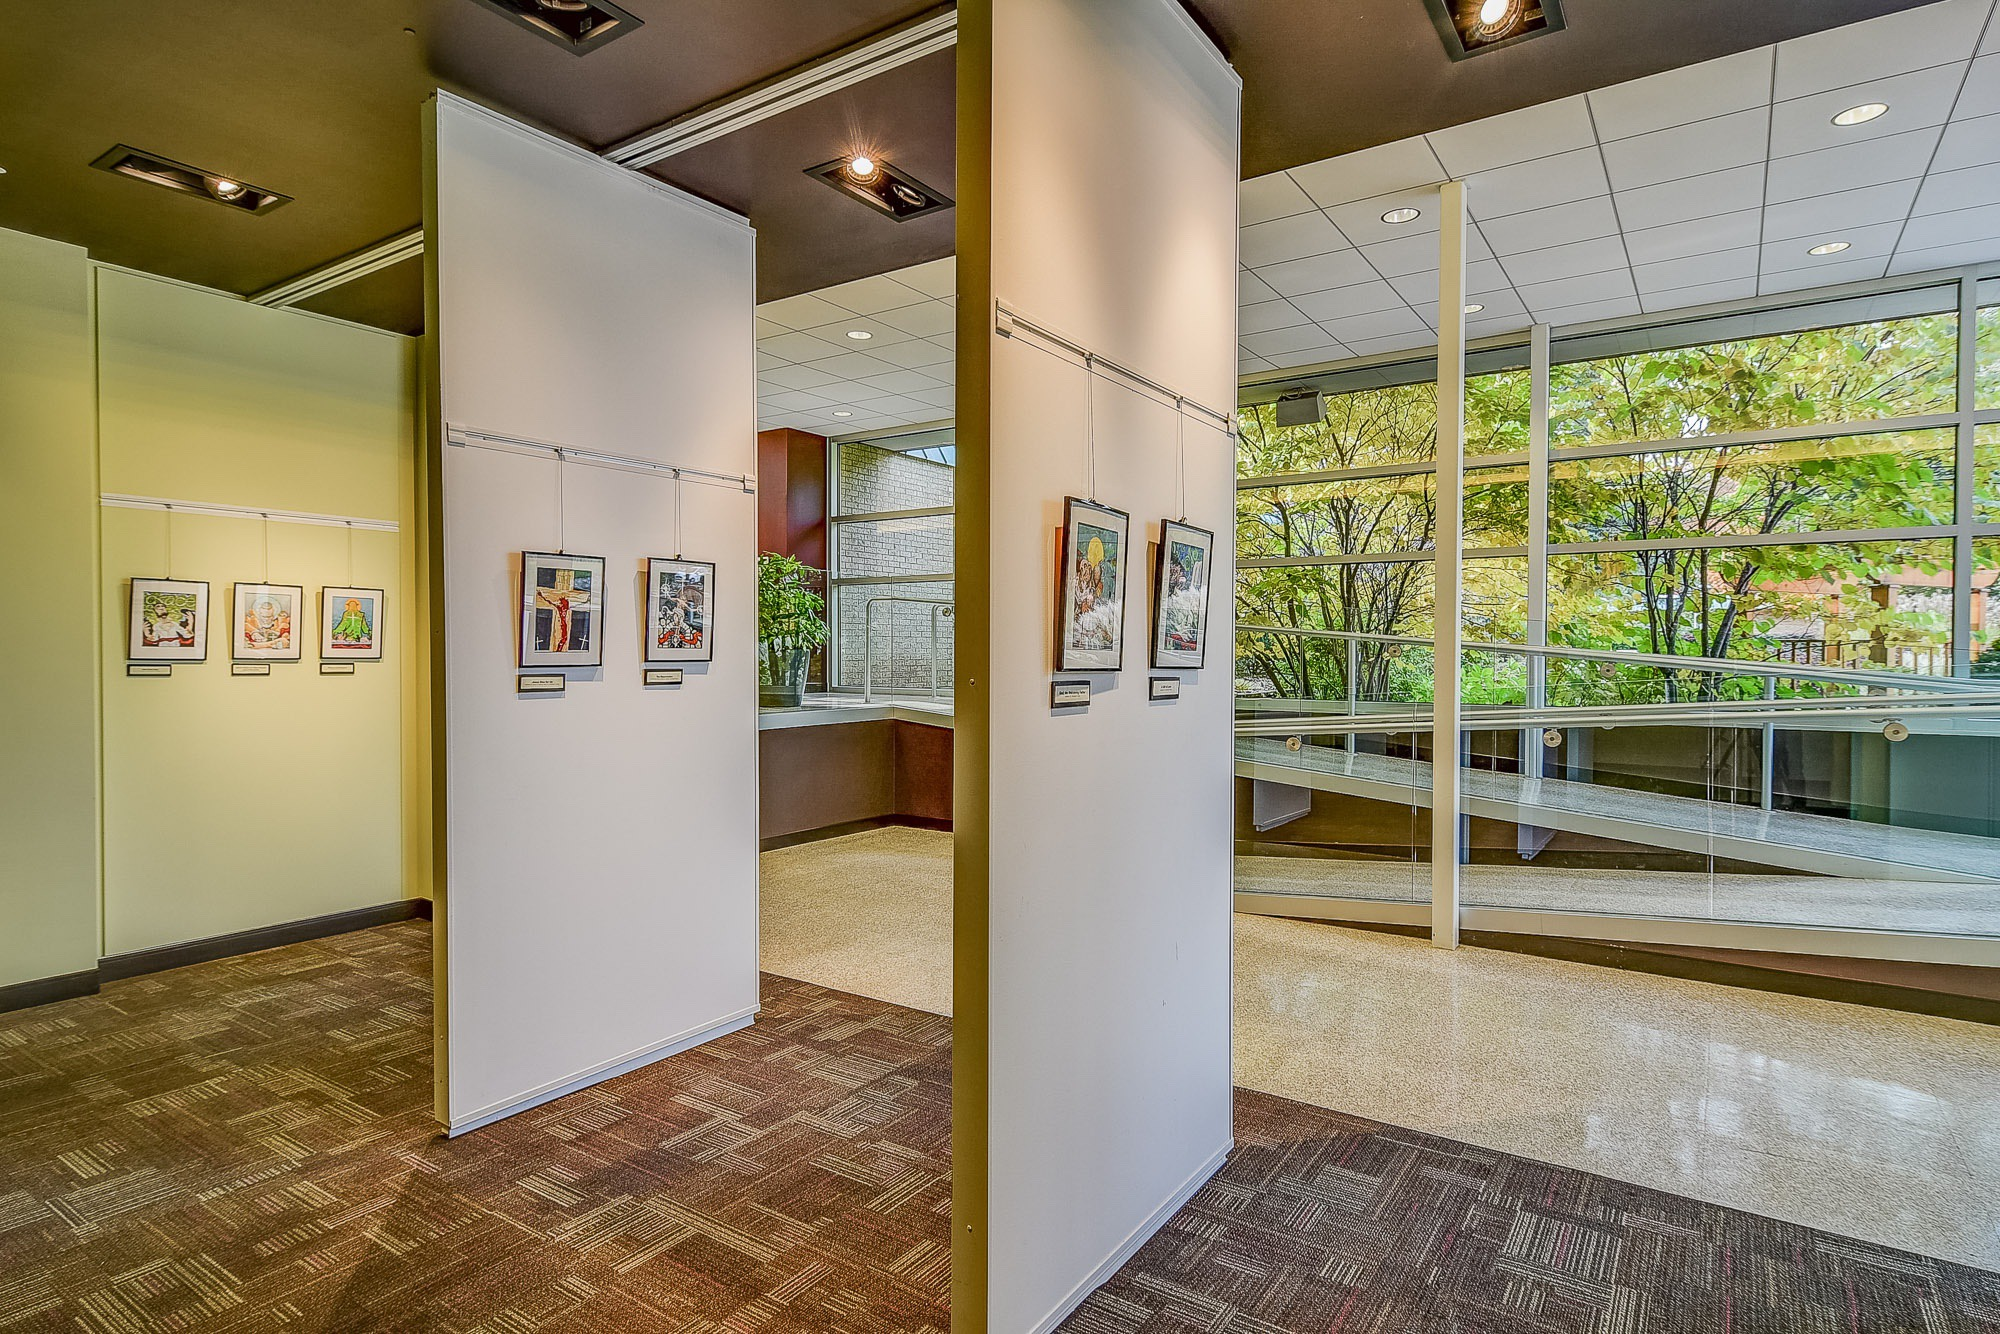 Leep Art Gallery at Postma Center